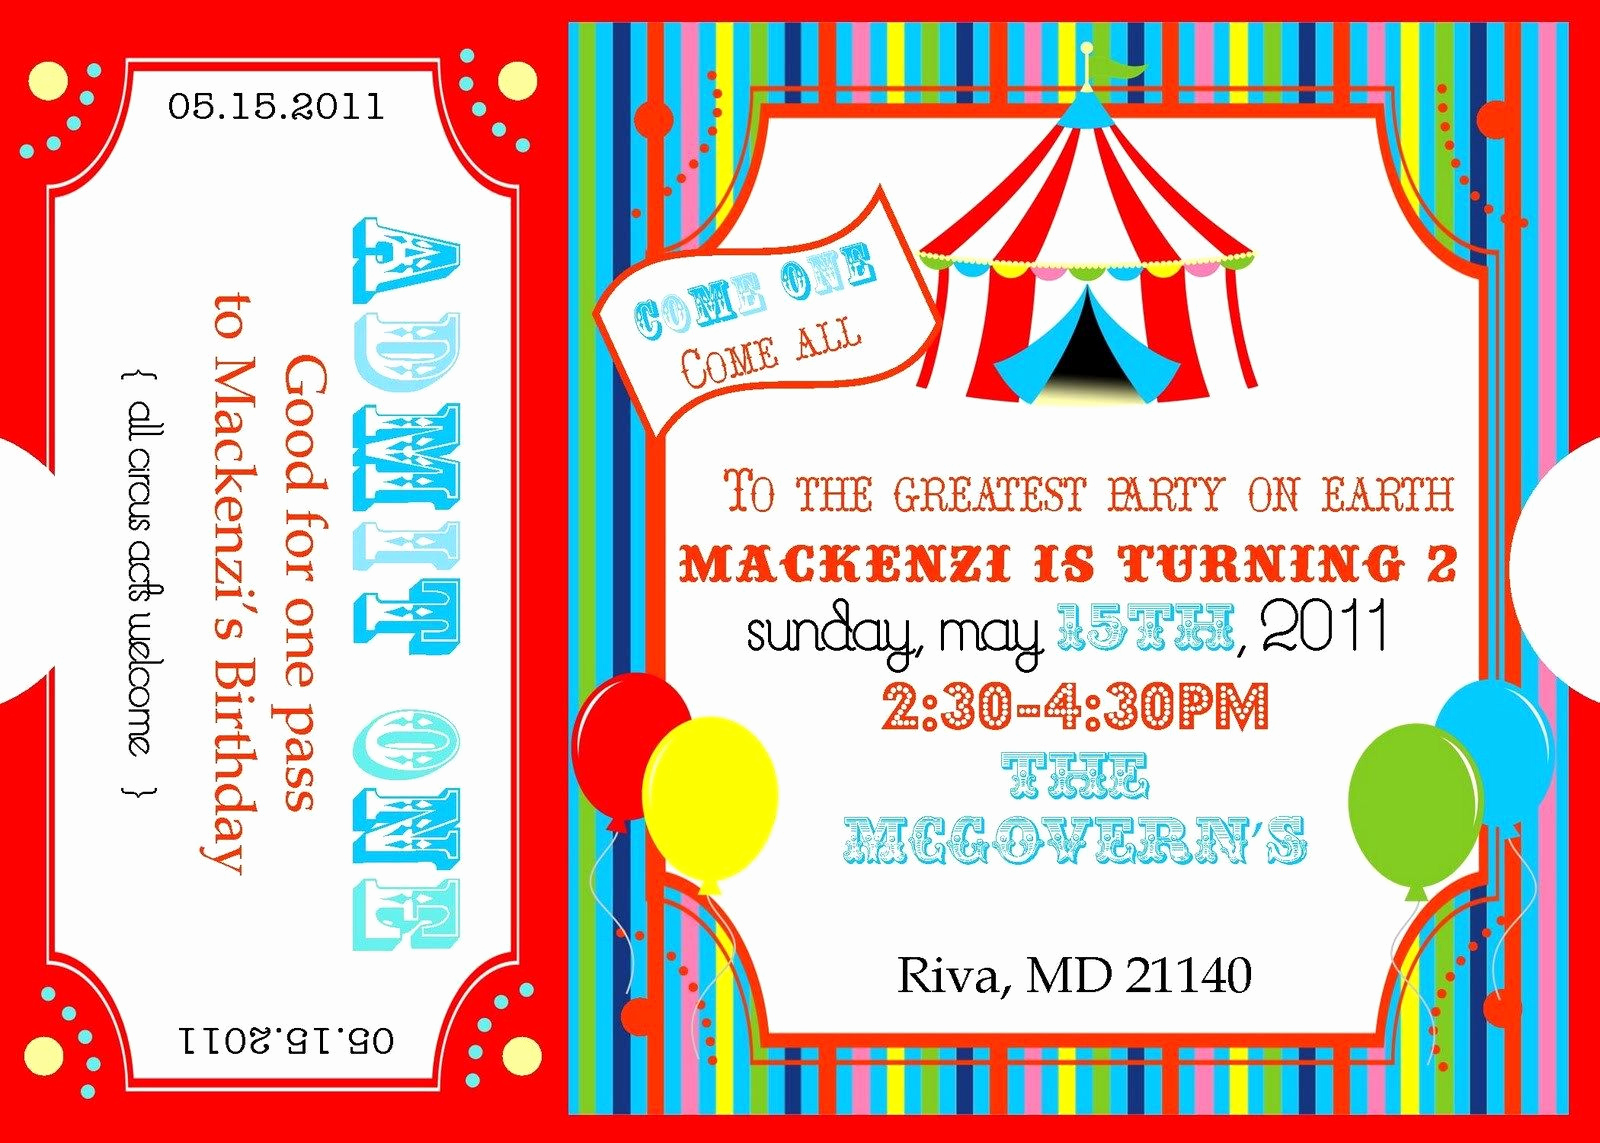 Free Printable Carnival Invitation Templates Awesome Free Printable Circus Invitation Templates Please forgive